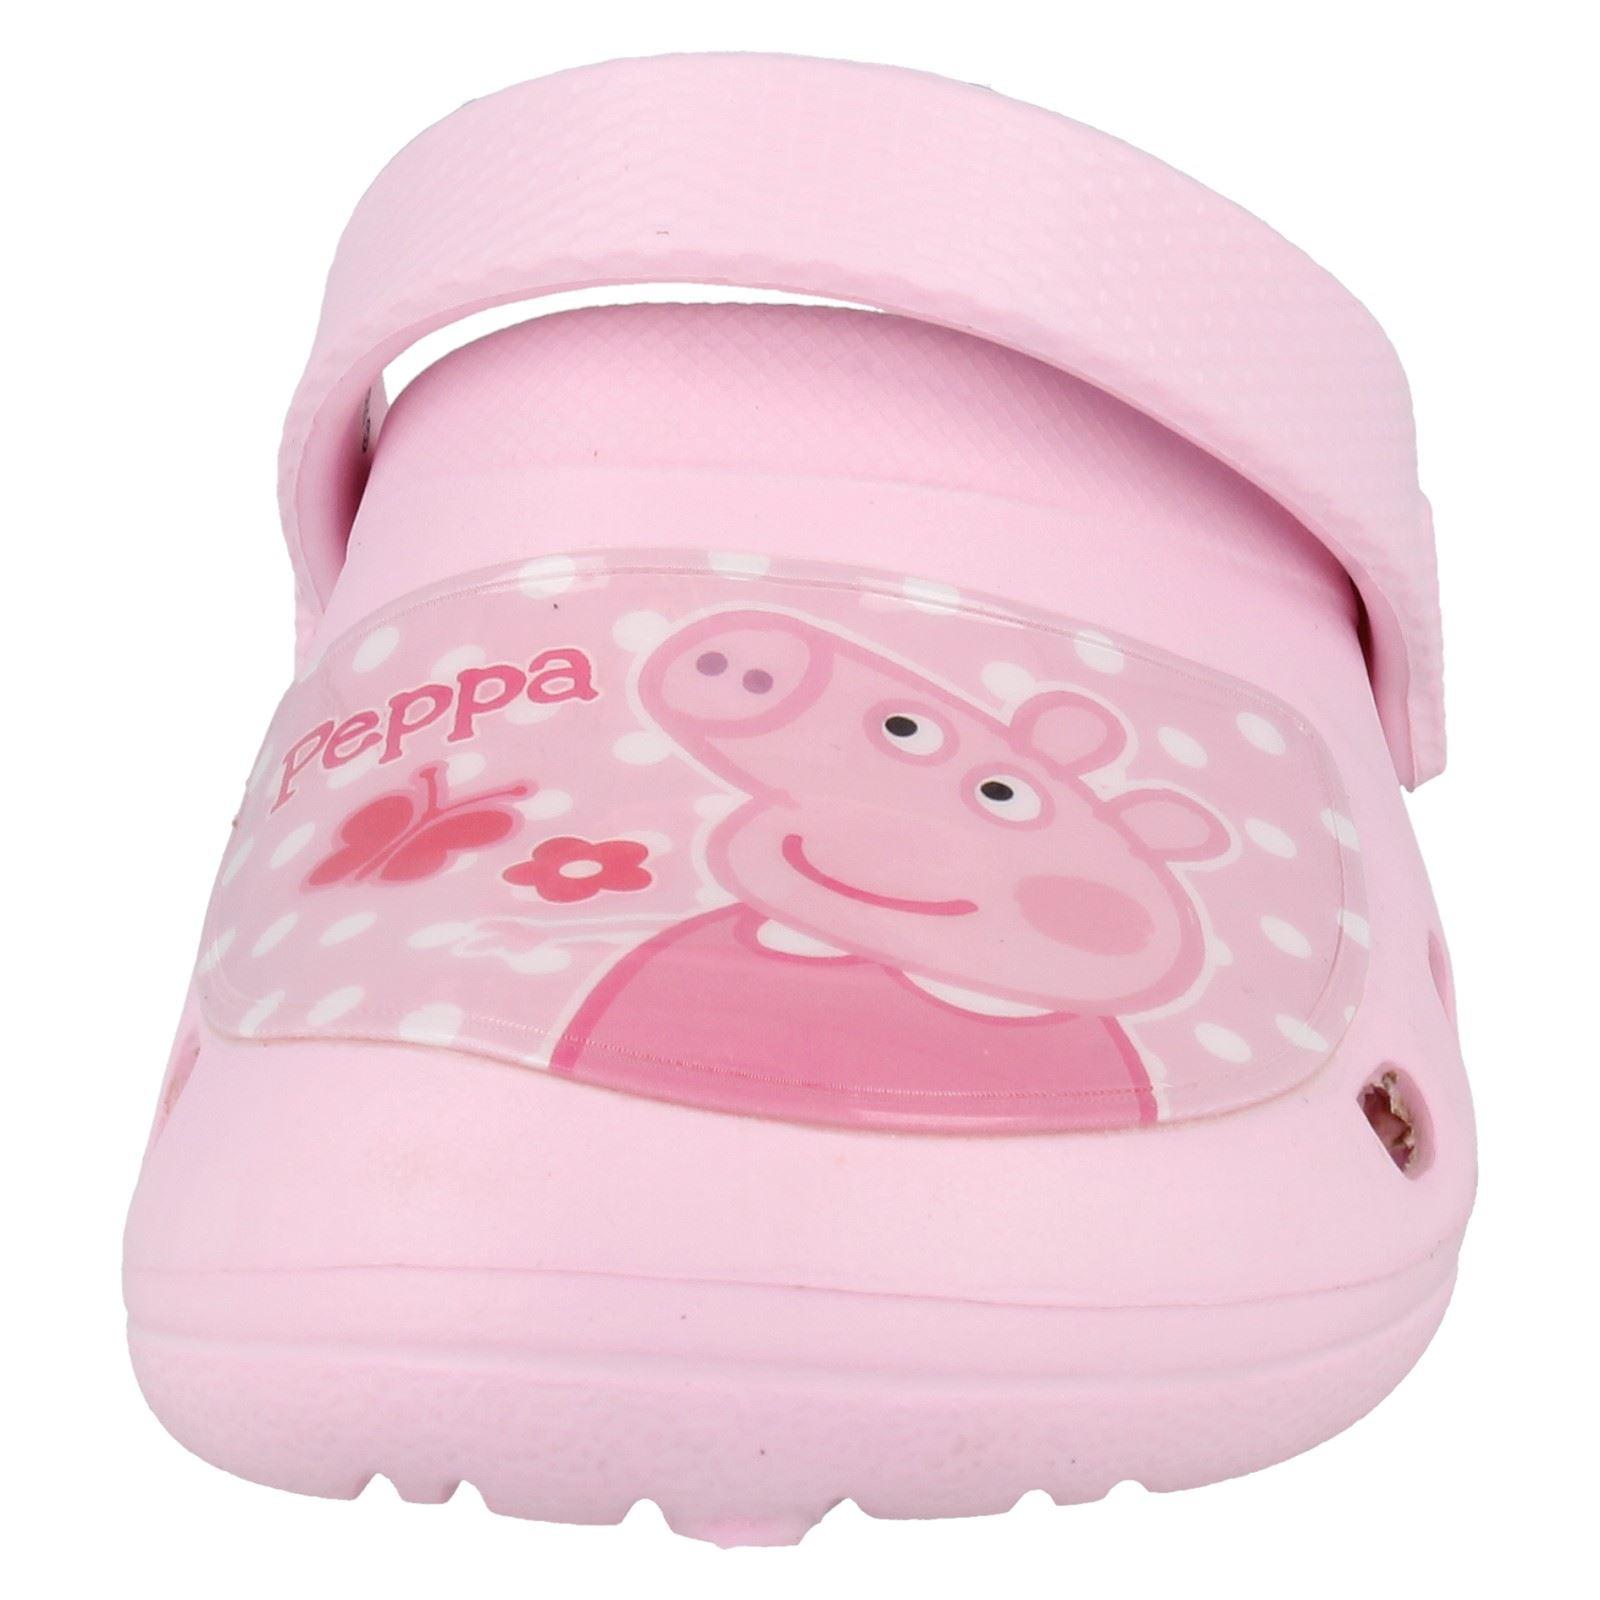 Girls Peppa Pig Clog Sandals Style - Wonder EVA Clog